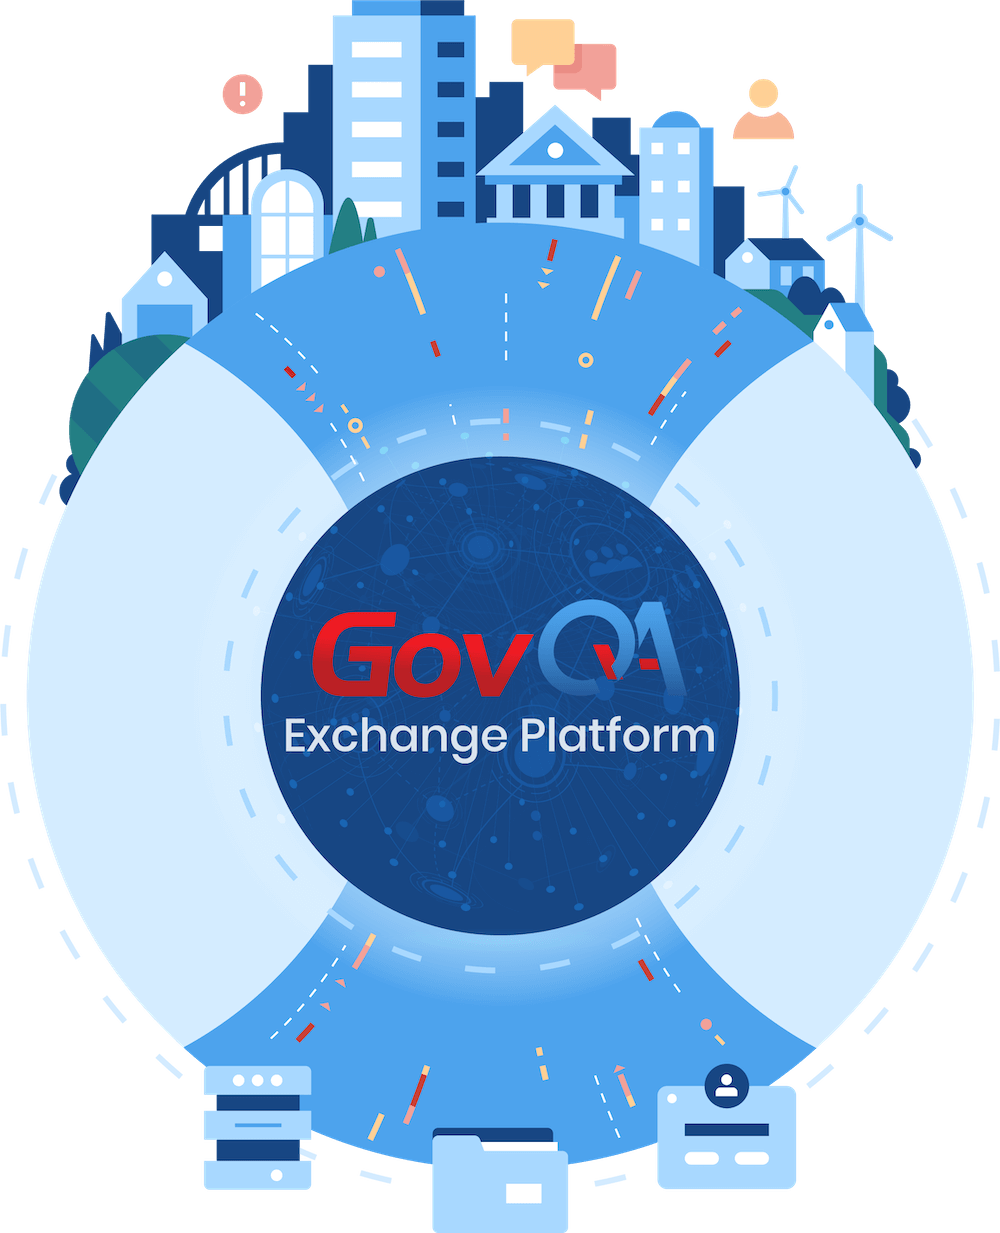 GovQA Exchange platform government workflow management animation